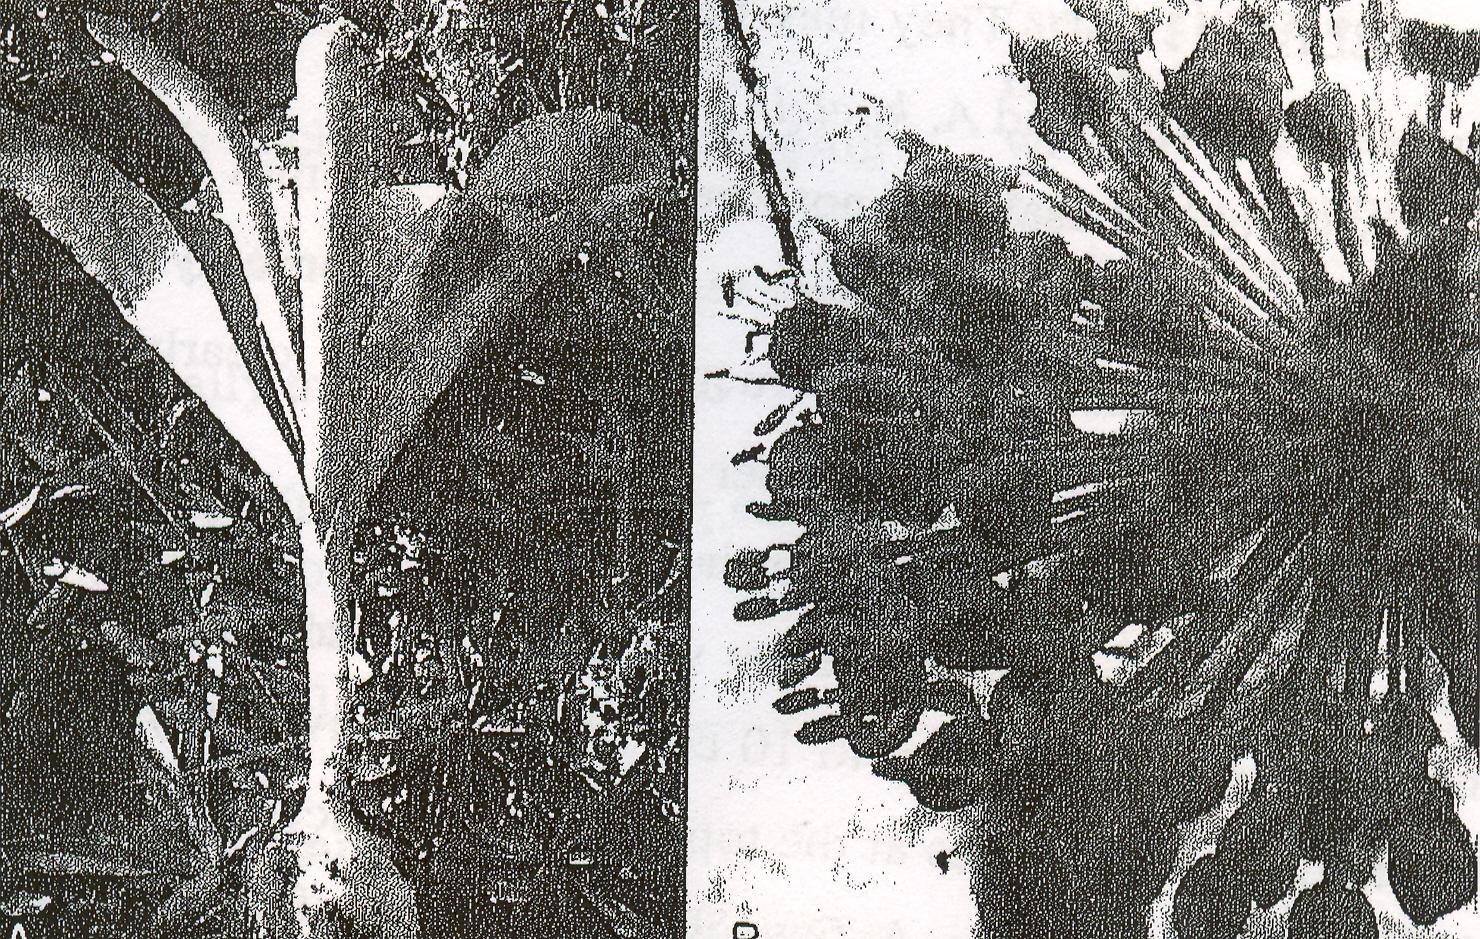 Allium%20koelzii.jpg